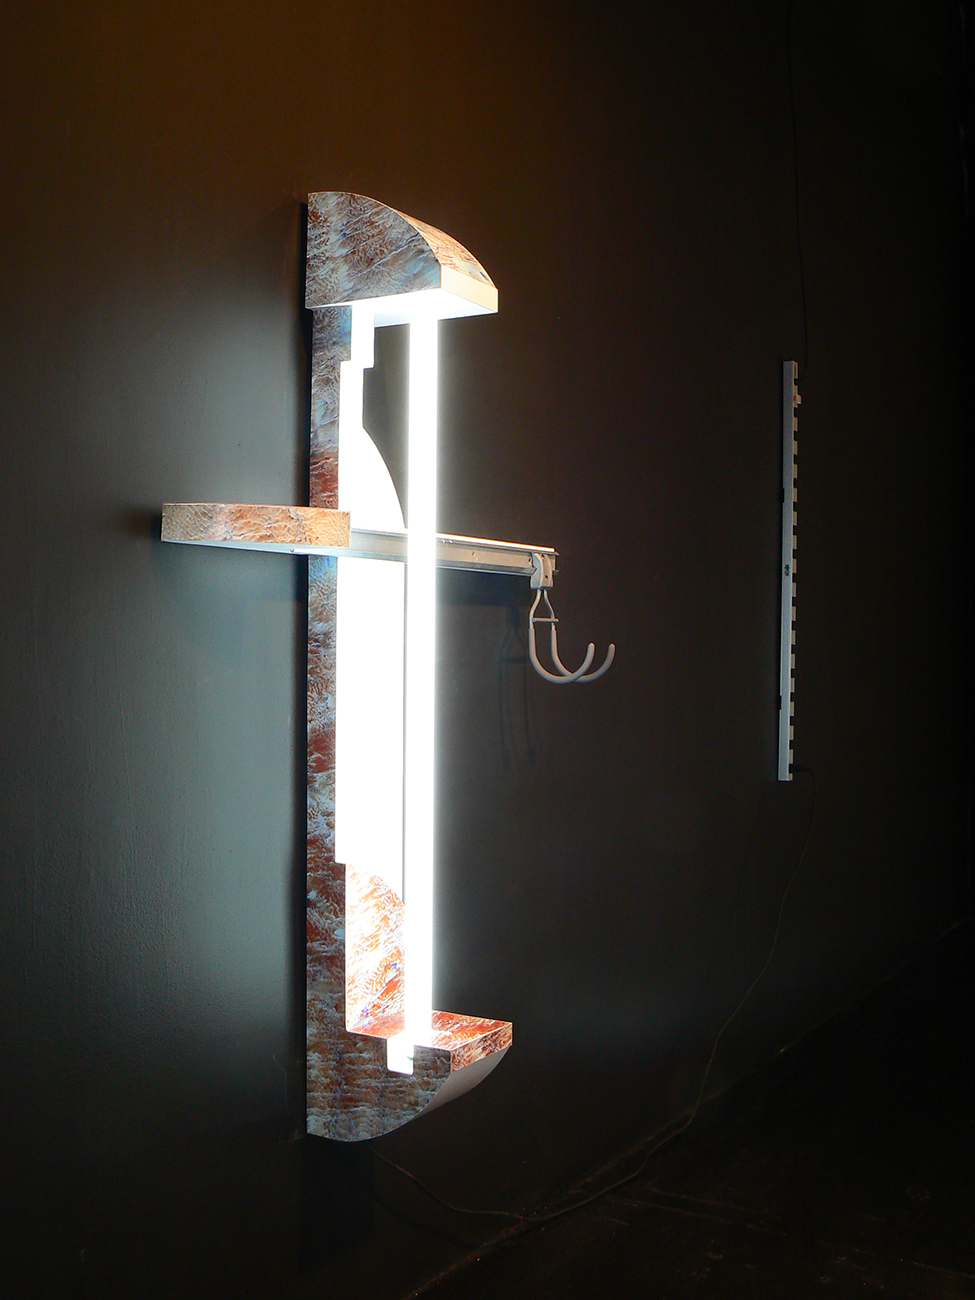 Araga Lamp 2013 Custom laminate, wood, fluorescent light, Elfa storage shelf and hook, power-strip 54 x 36 in/ 137.2 x 91.4 cm